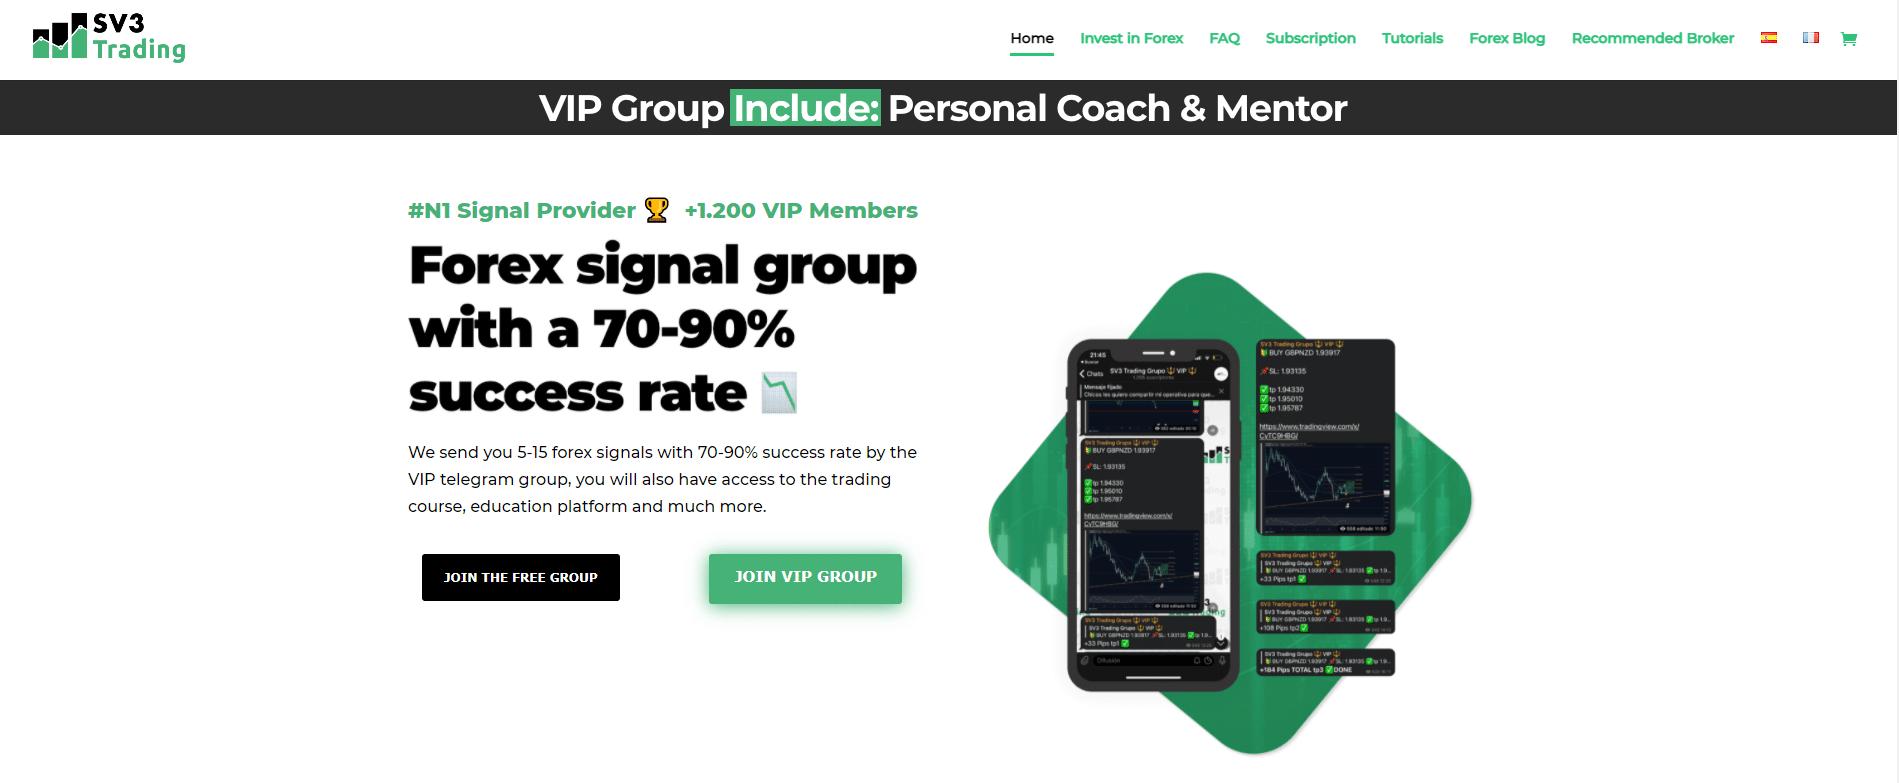 SV3 Trading presentation